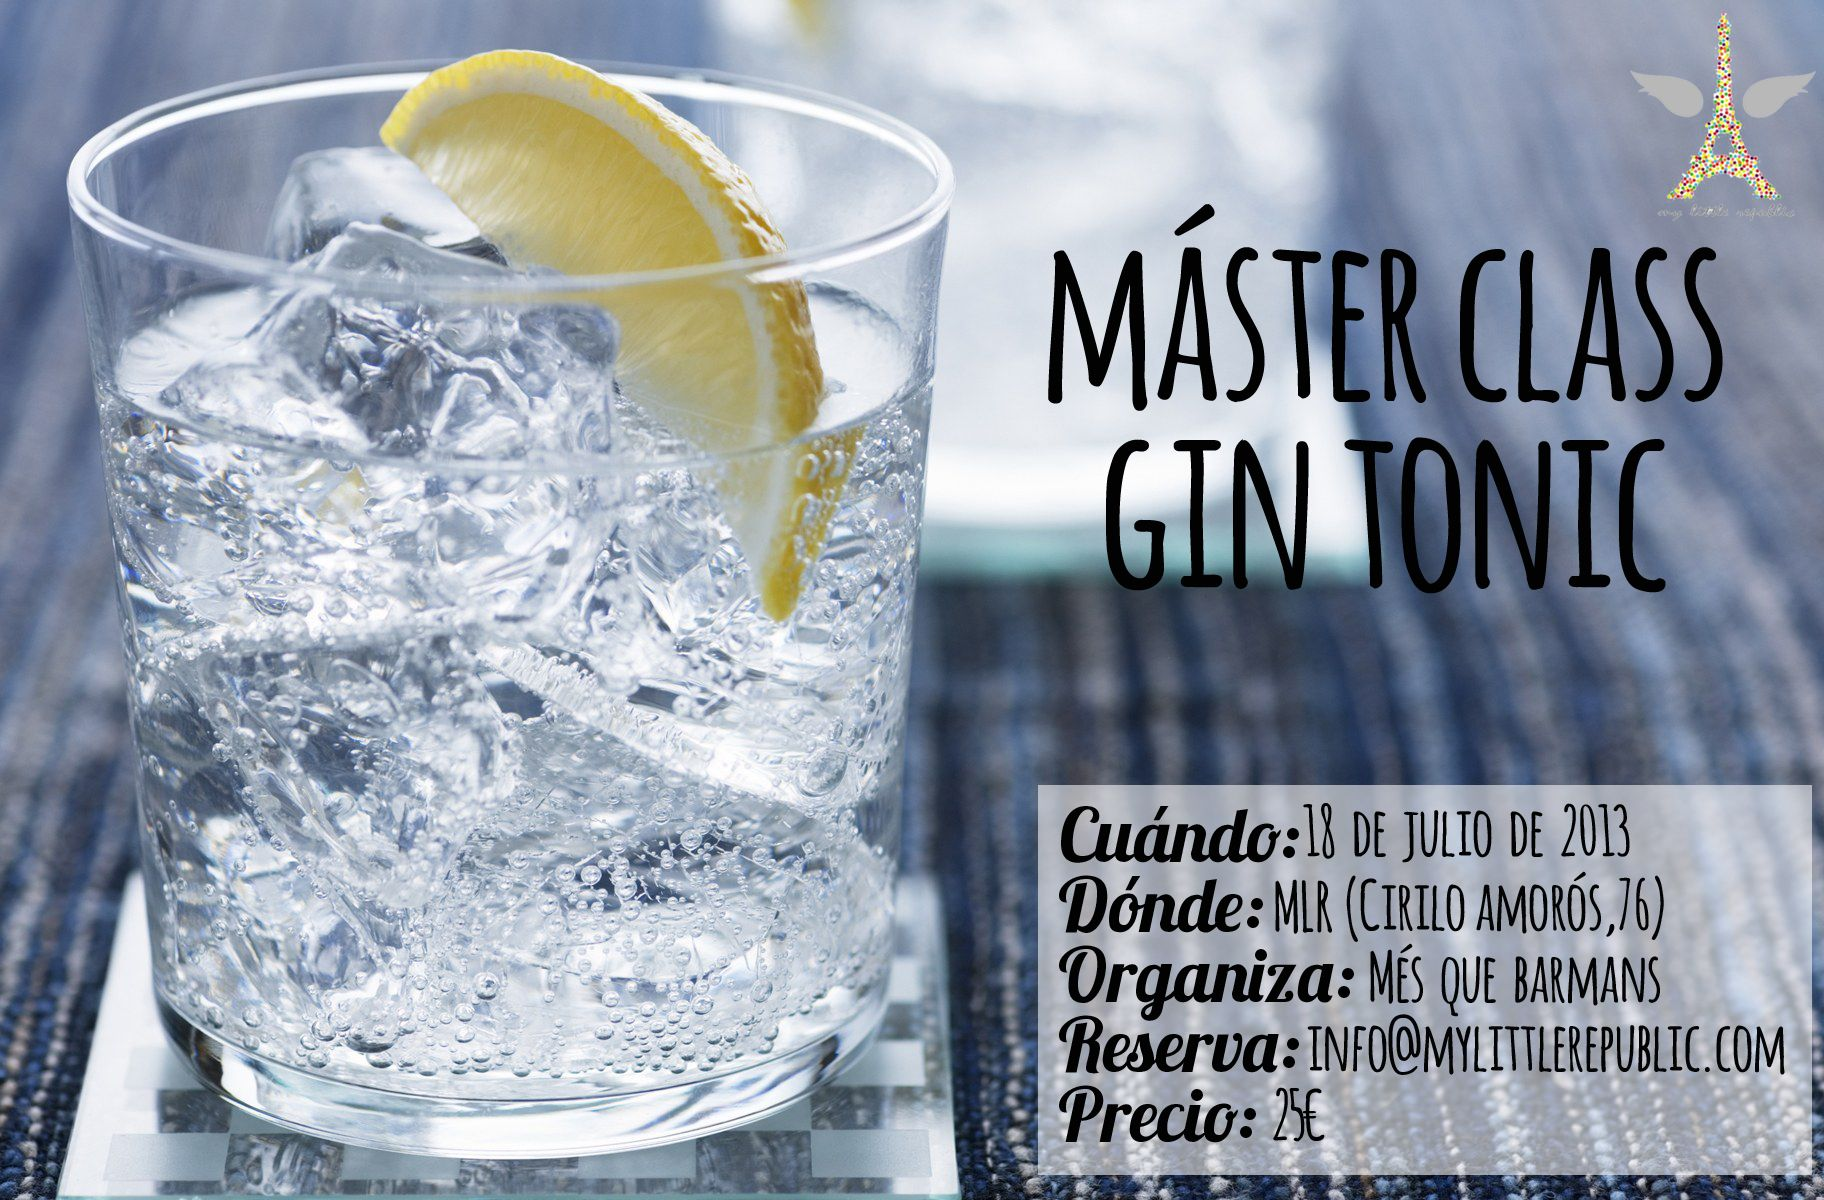 Máster Class Gin Tonic 18 de Julio de 2013